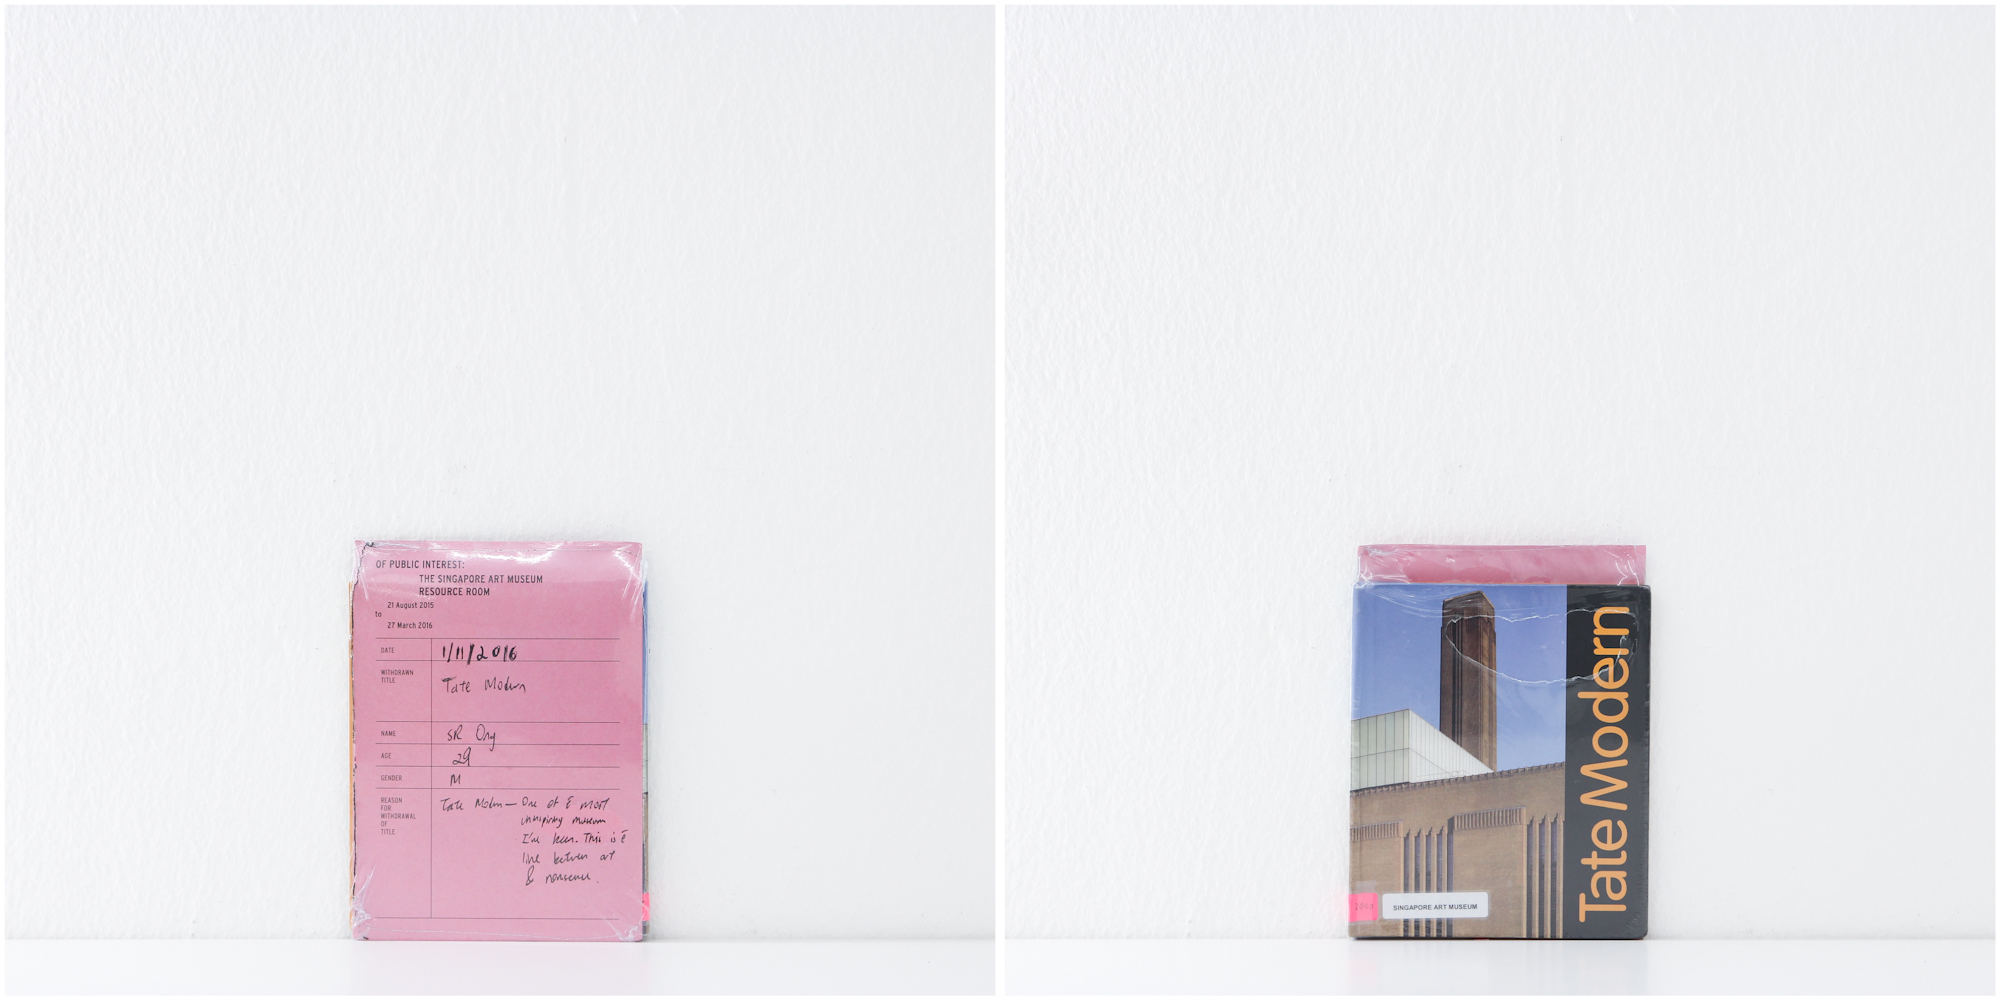 'Tate Modern', 1/11/15, SR Ong, 29, Male